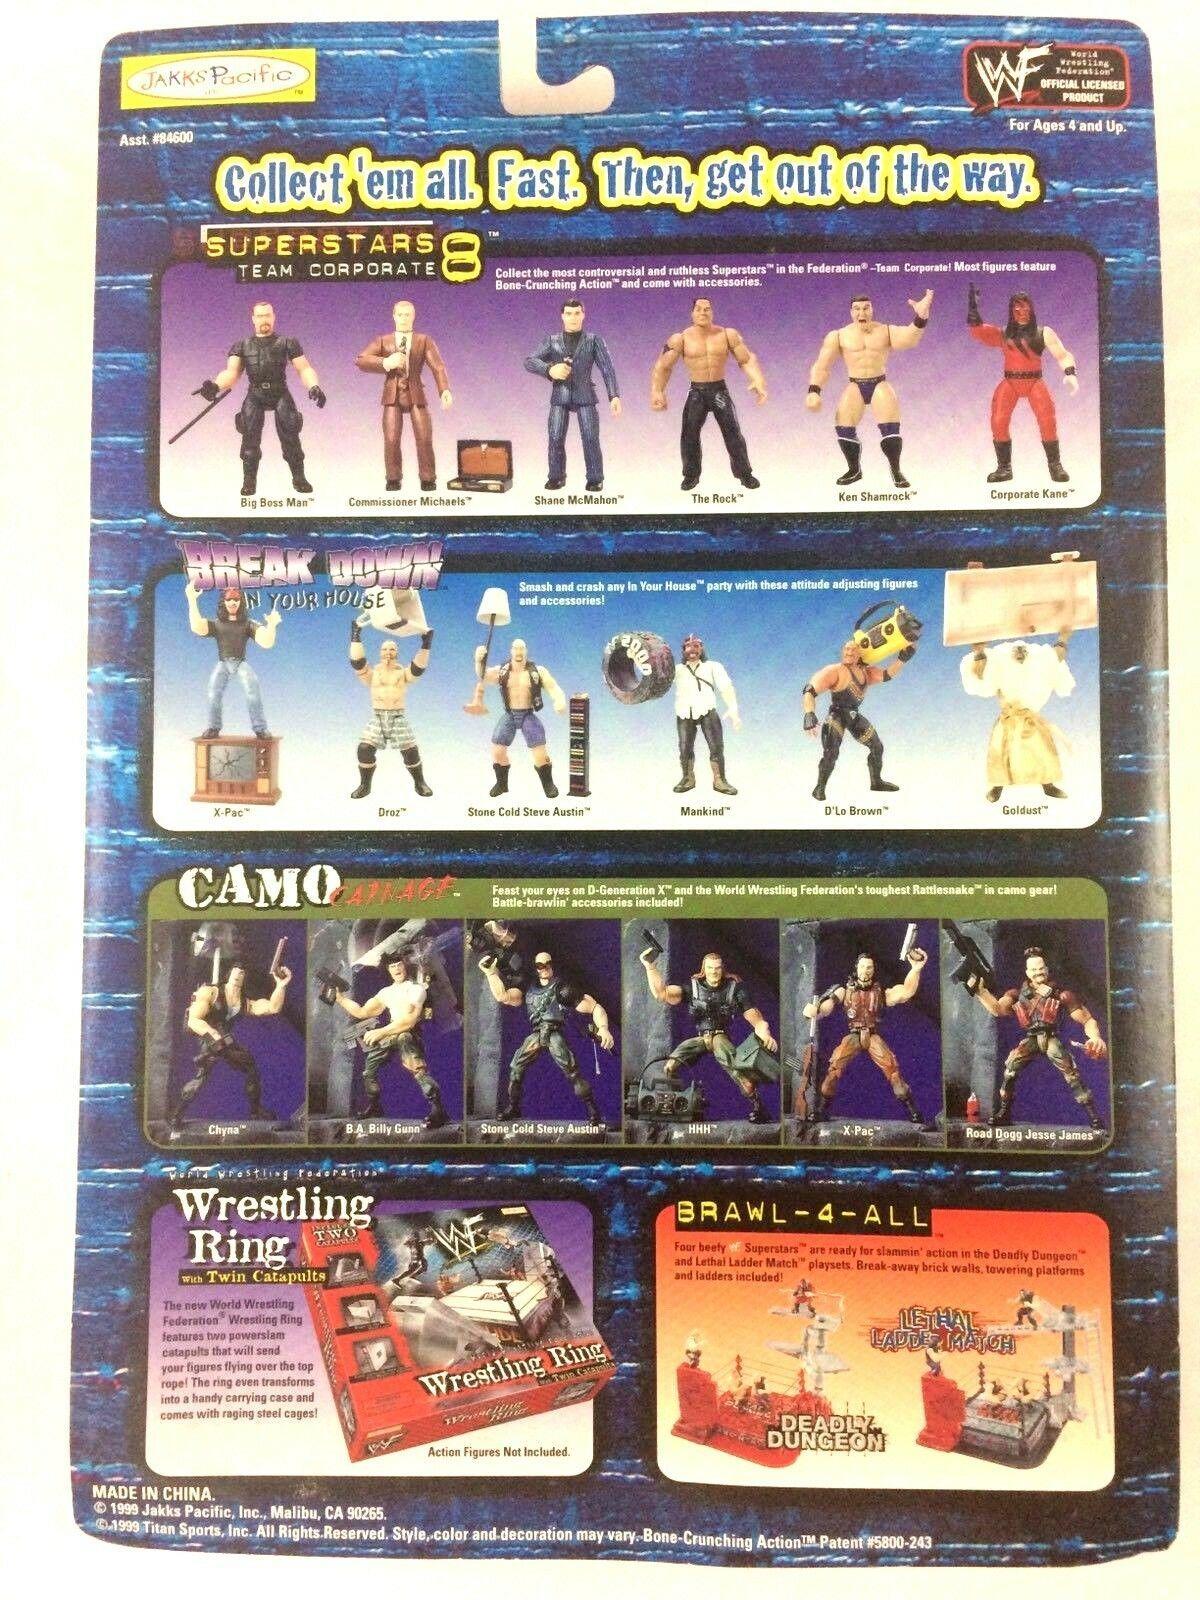 Ken Shamrock WWF WWE Jakks Action Figure Superstars 8 1999 Sealed